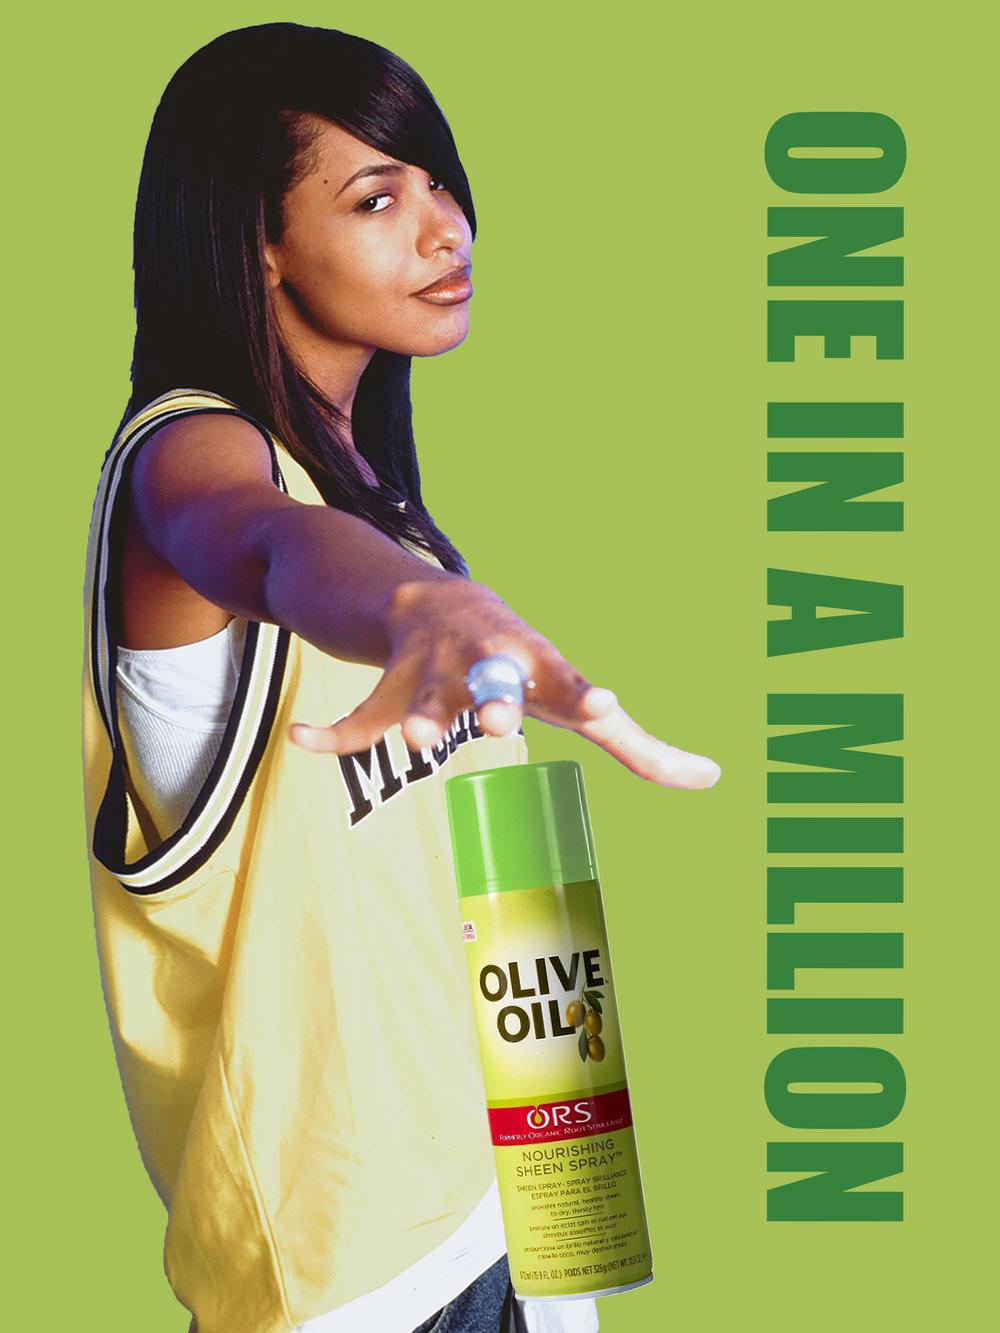 aaliyah-poster-18x24.jpg